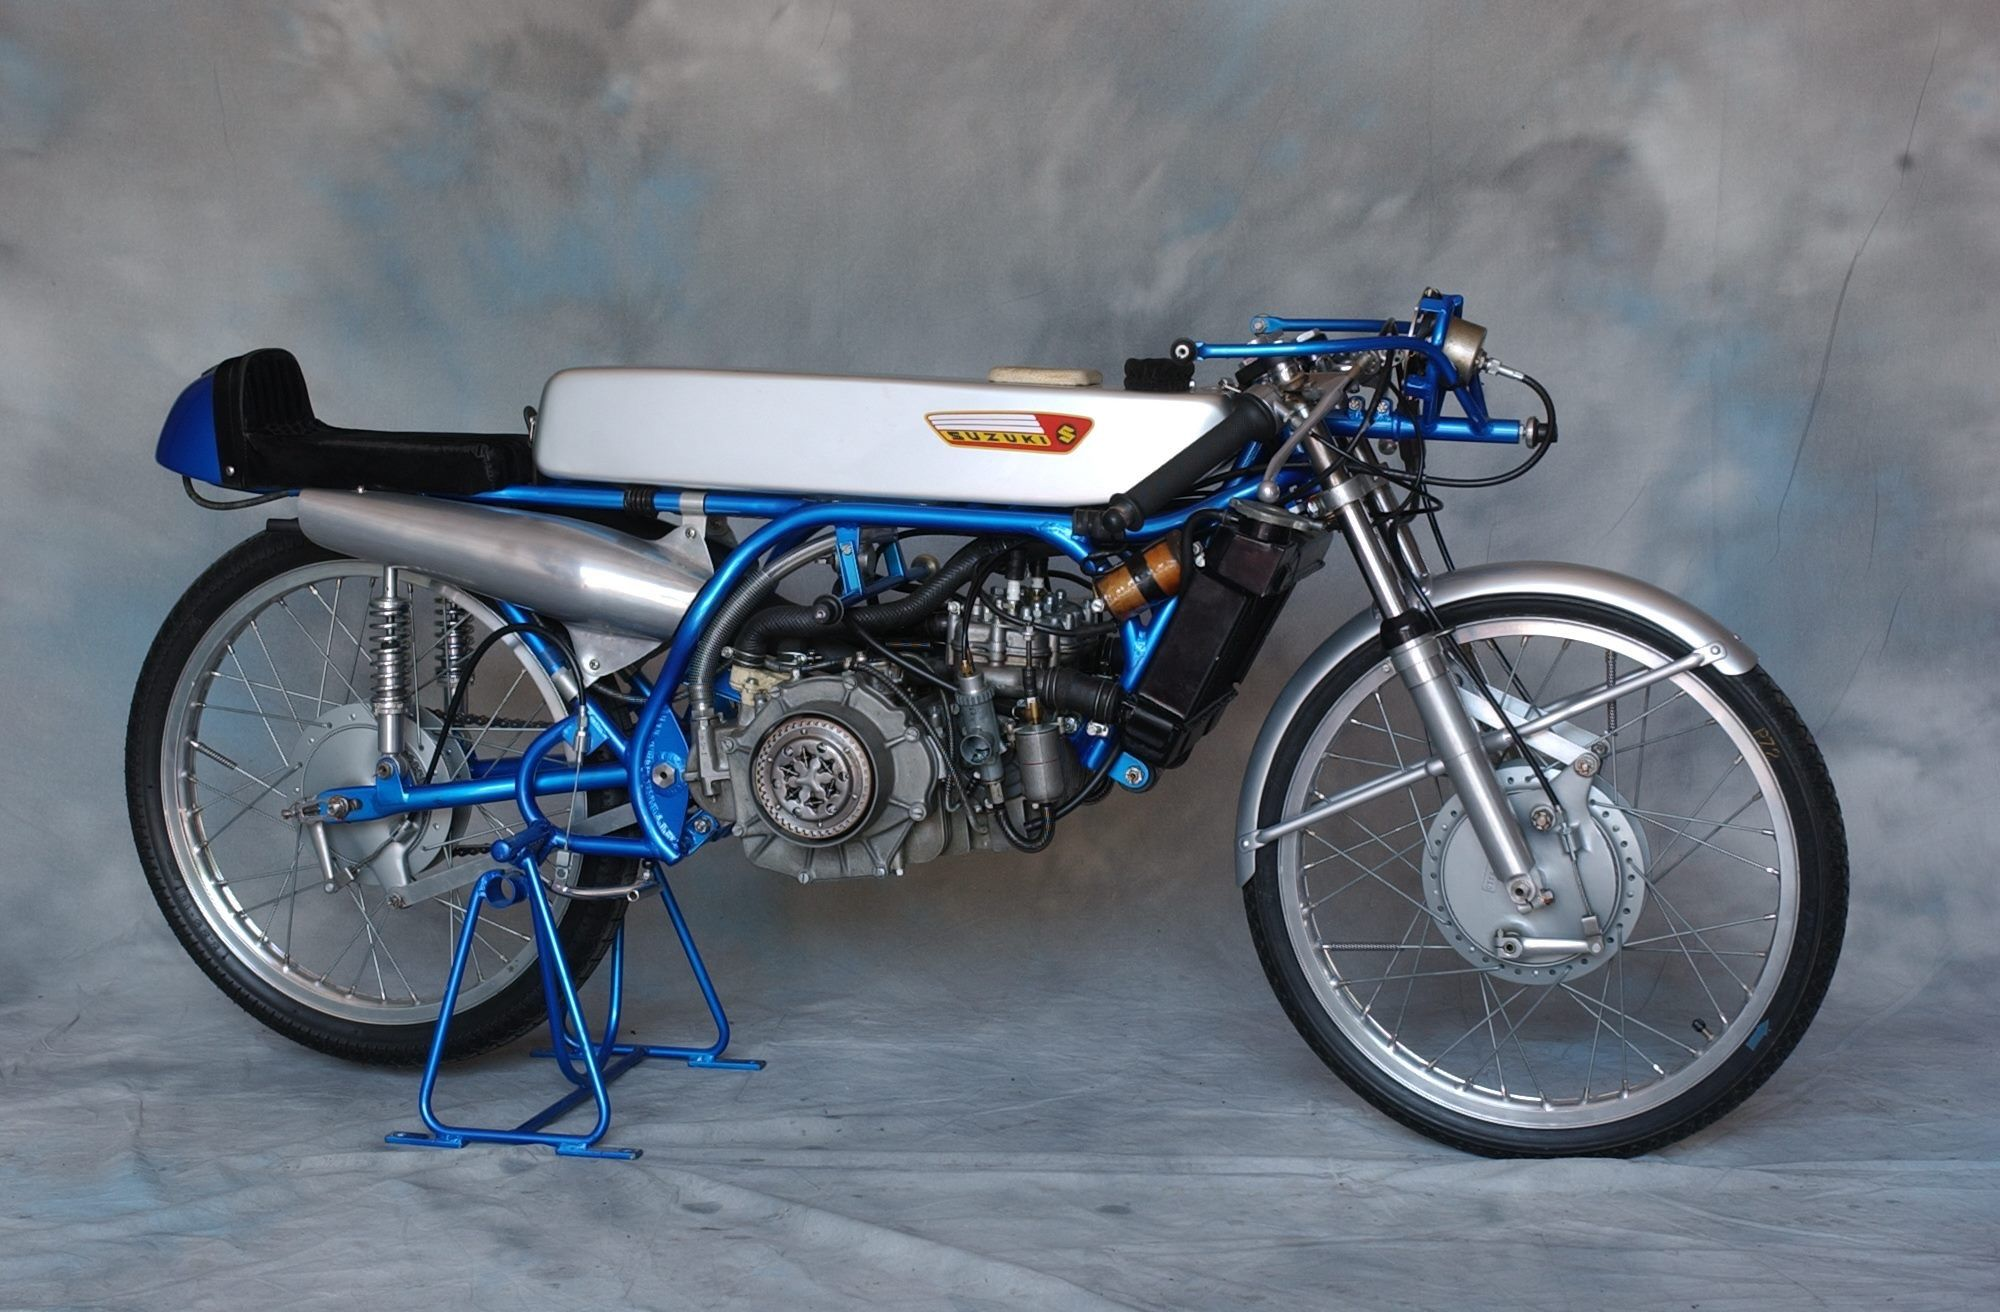 Honda rc162 rc 162 1961 250 four race motorcycle bike picture print - Honda Rc116 Rc149 Rc181 Jpg 455 302 Moped Pinterest Mopeds And Honda